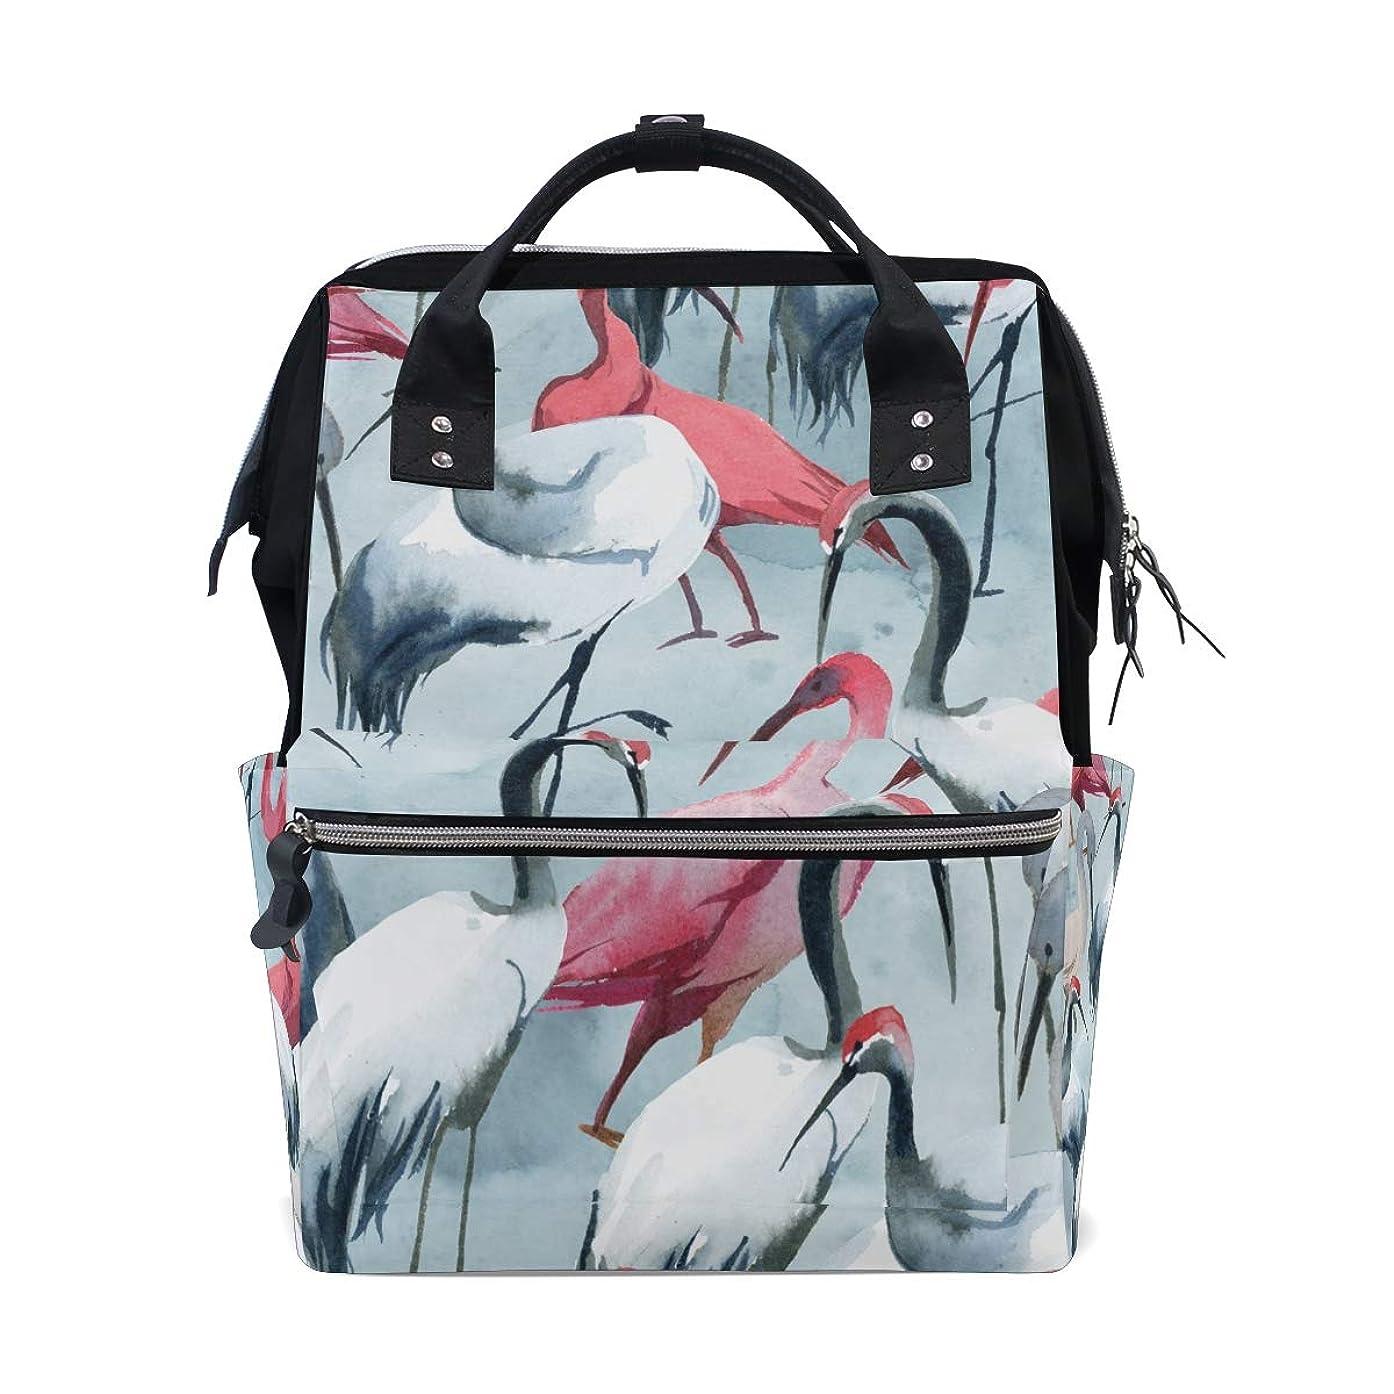 White Pink Crane School Backpack Large Capacity Mummy Bags Laptop Handbag Casual Travel Rucksack Satchel For Women Men Adult Teen Children